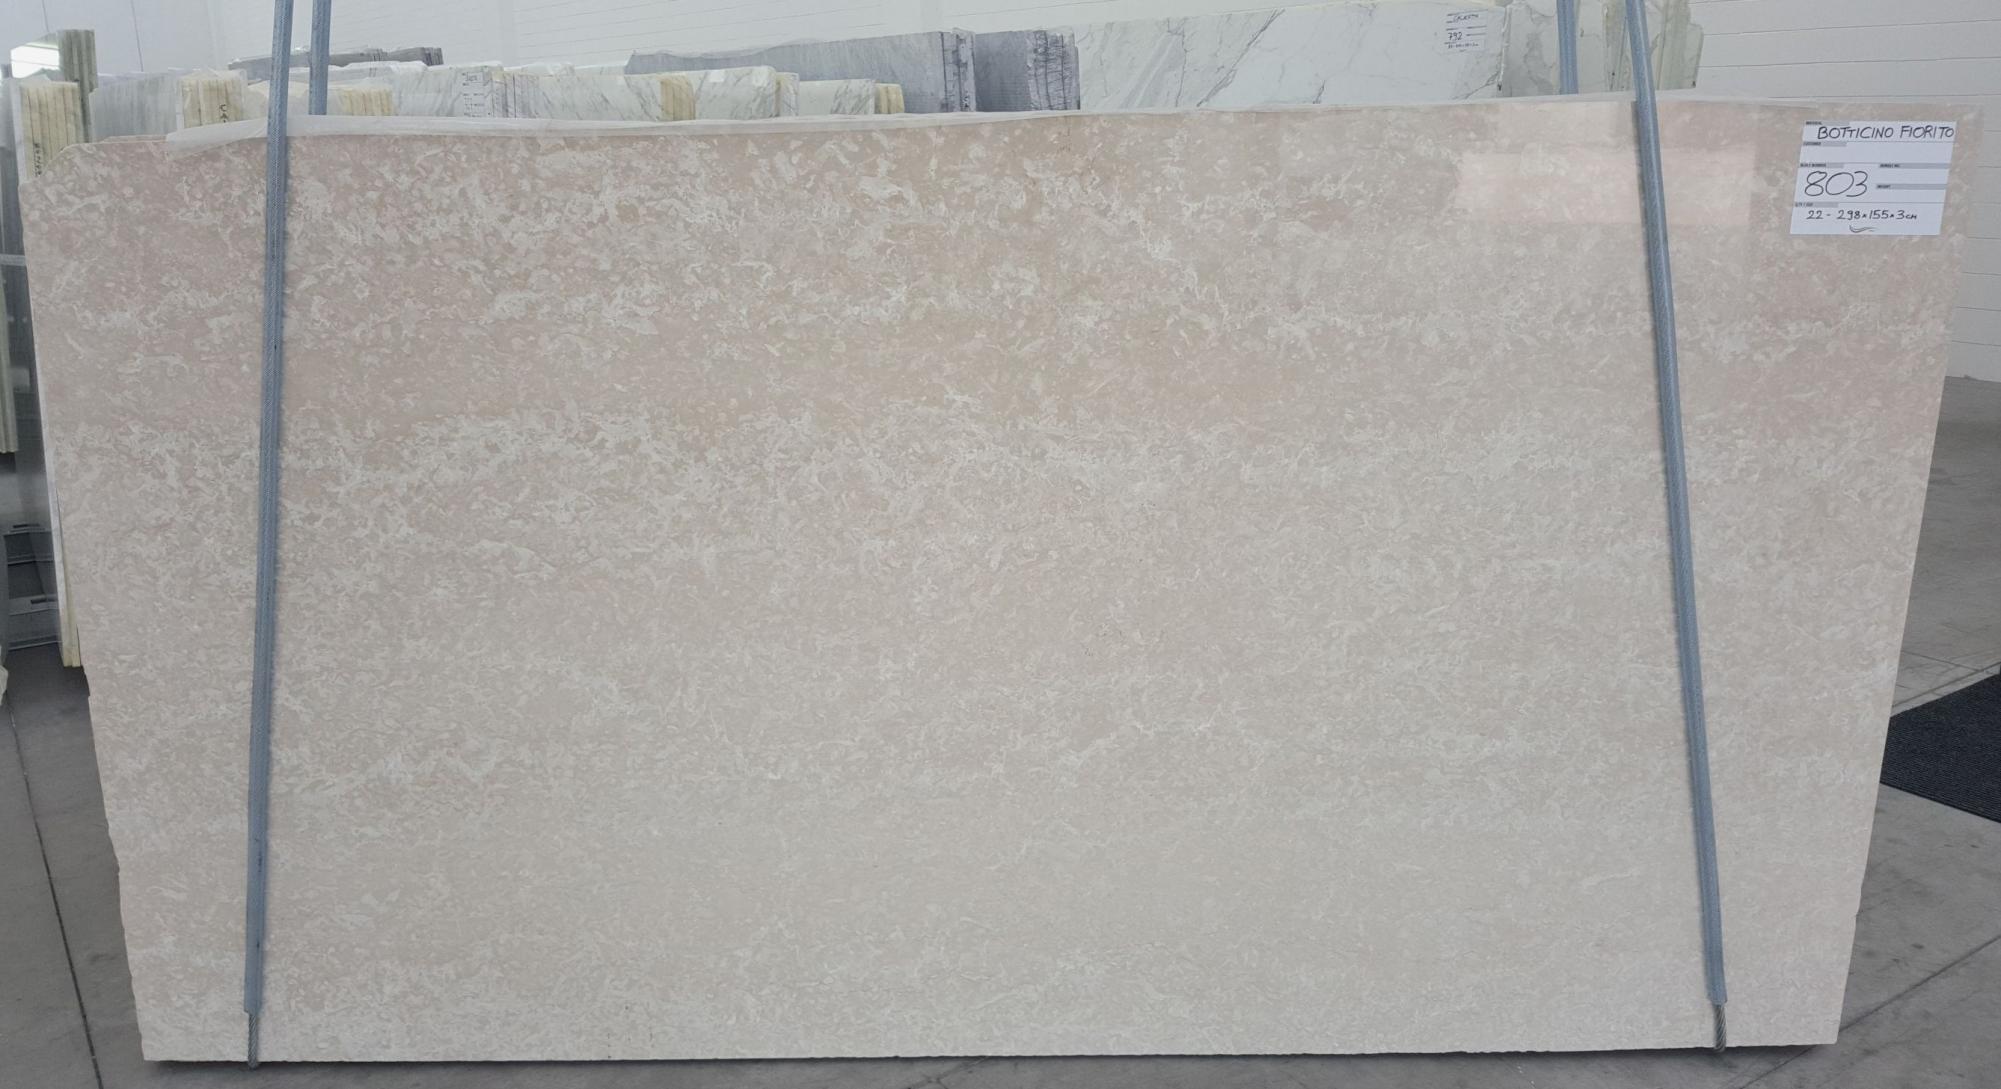 BOTTICINO FIORITO LIGHT polished slabs 1149 , Bundle #1-2 natural marble